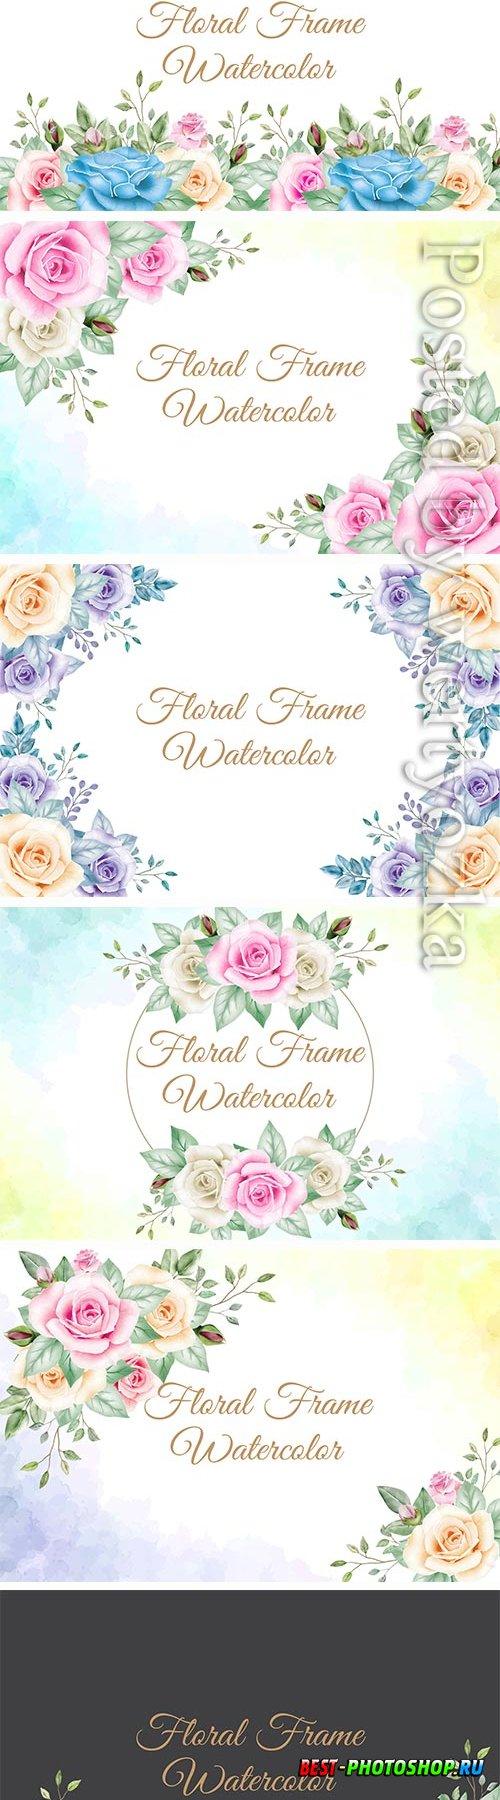 Floral frame watercolor vector design